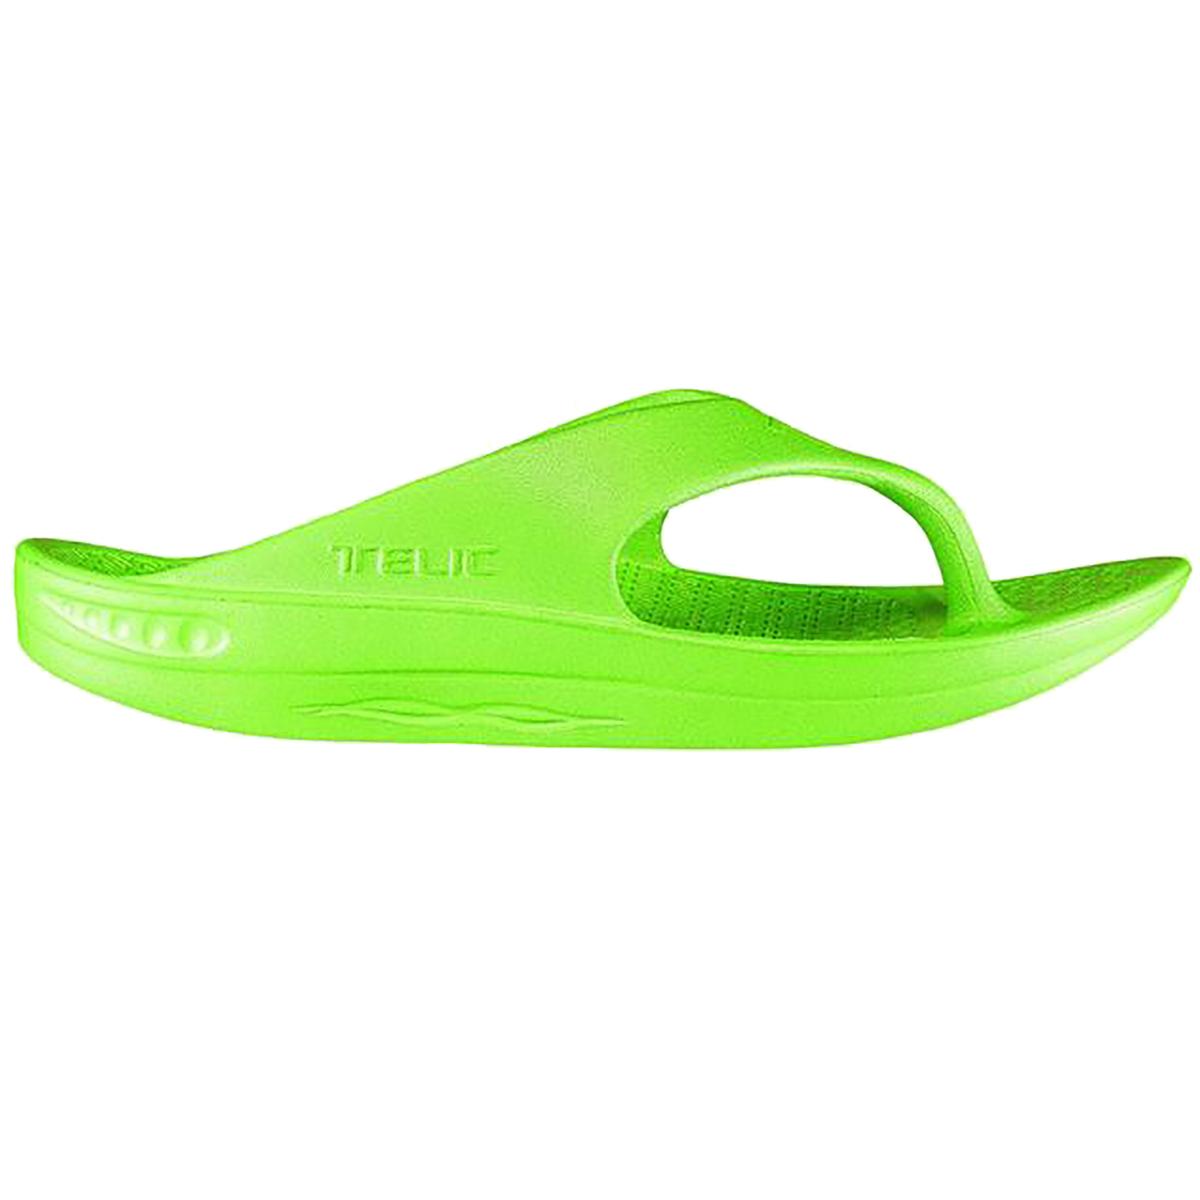 Telic-Unisex-Signature-Style-Arch-Support-Pain-Relief-Flip-Flops thumbnail 21